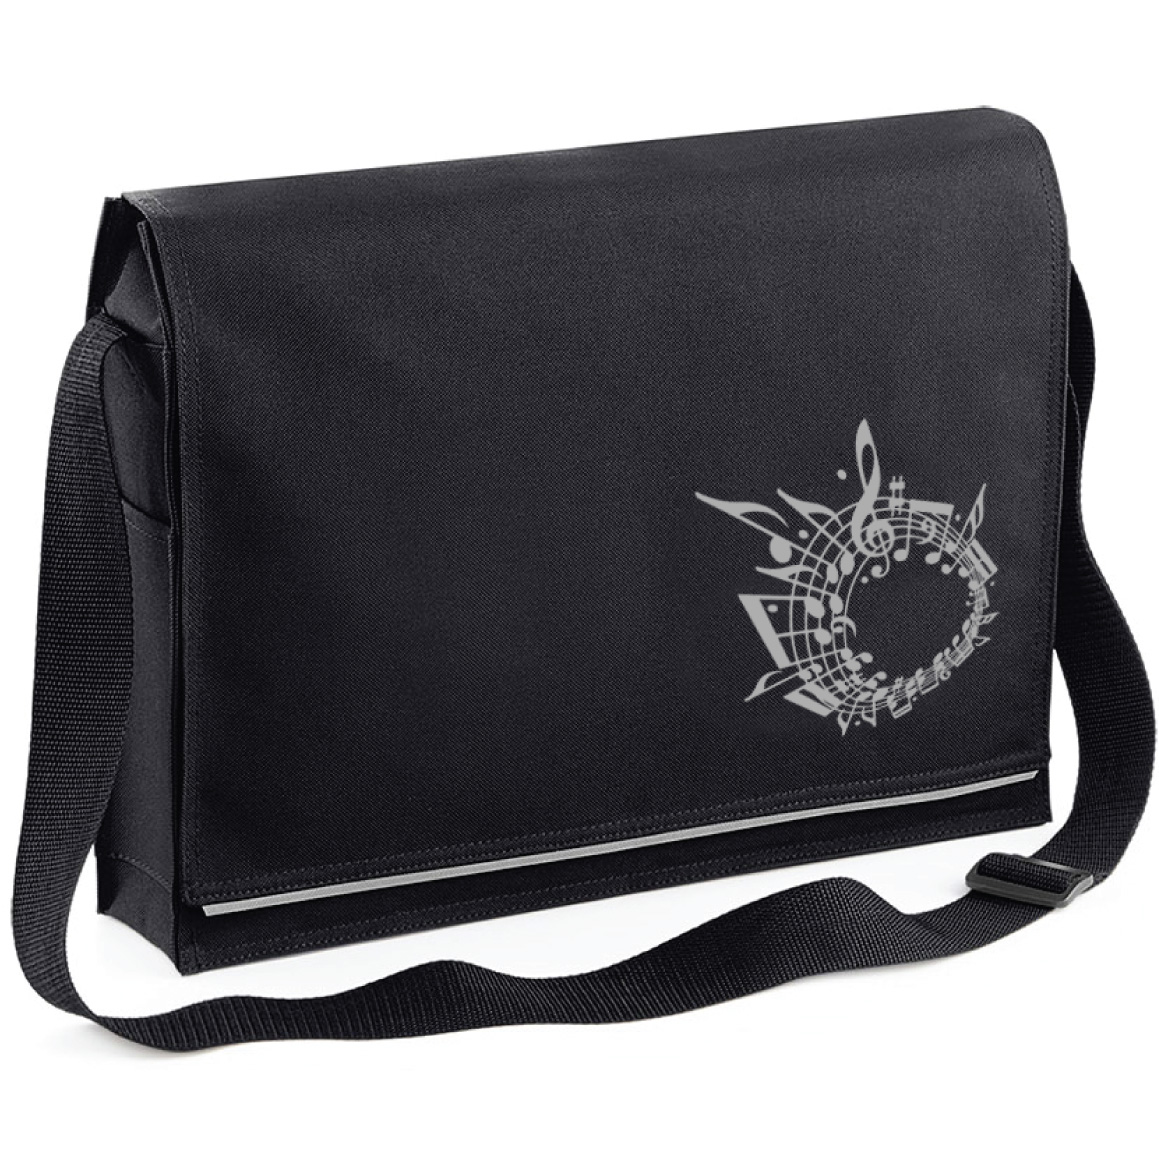 Mapac Black Music Messenger Bag: Music Bag